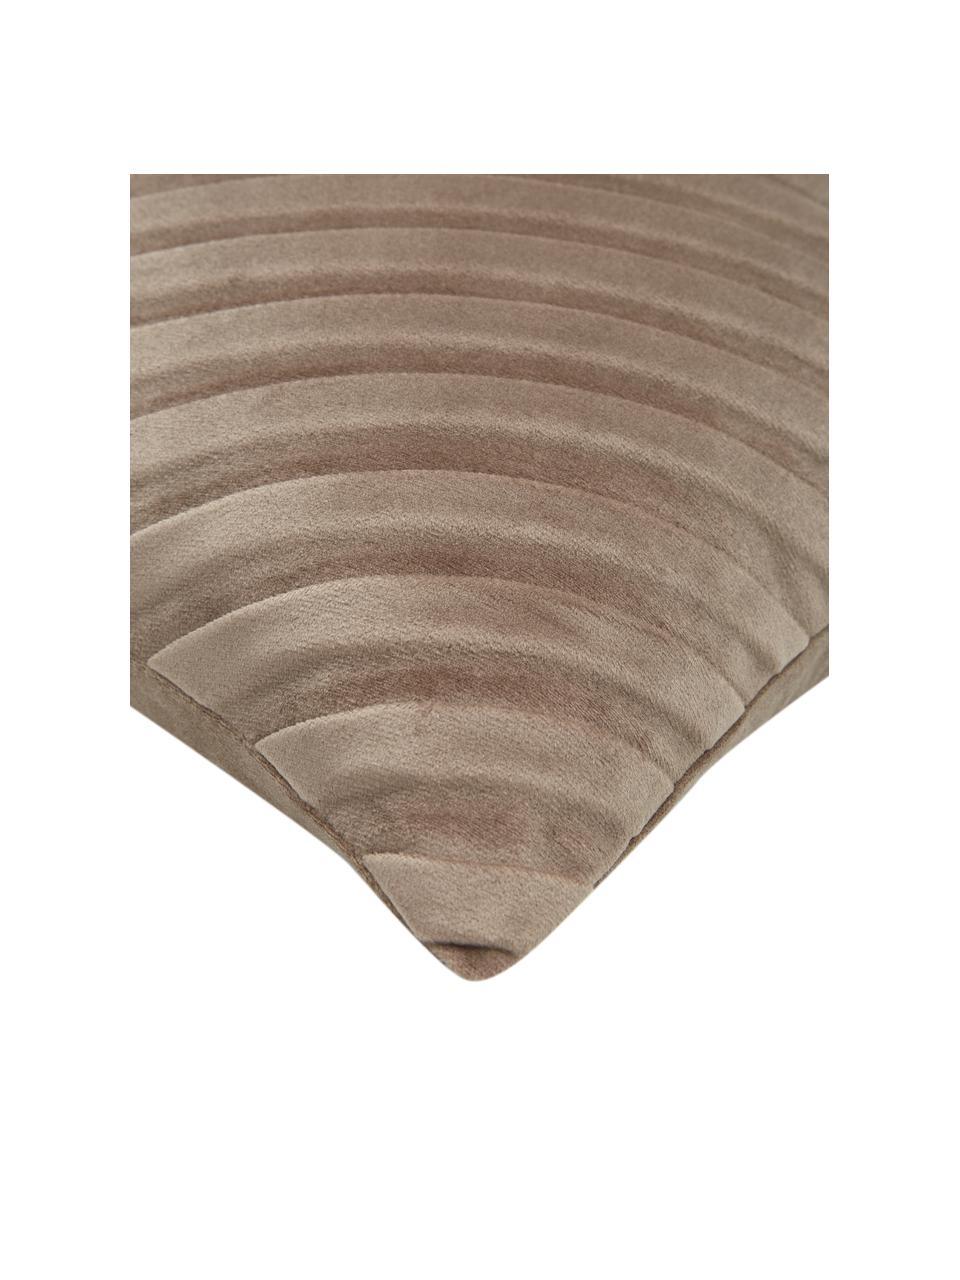 Funda de cojín de terciopelo texturizada Lucie, 100%terciopelo (poliéster), Beige, An 30 x L 50 cm